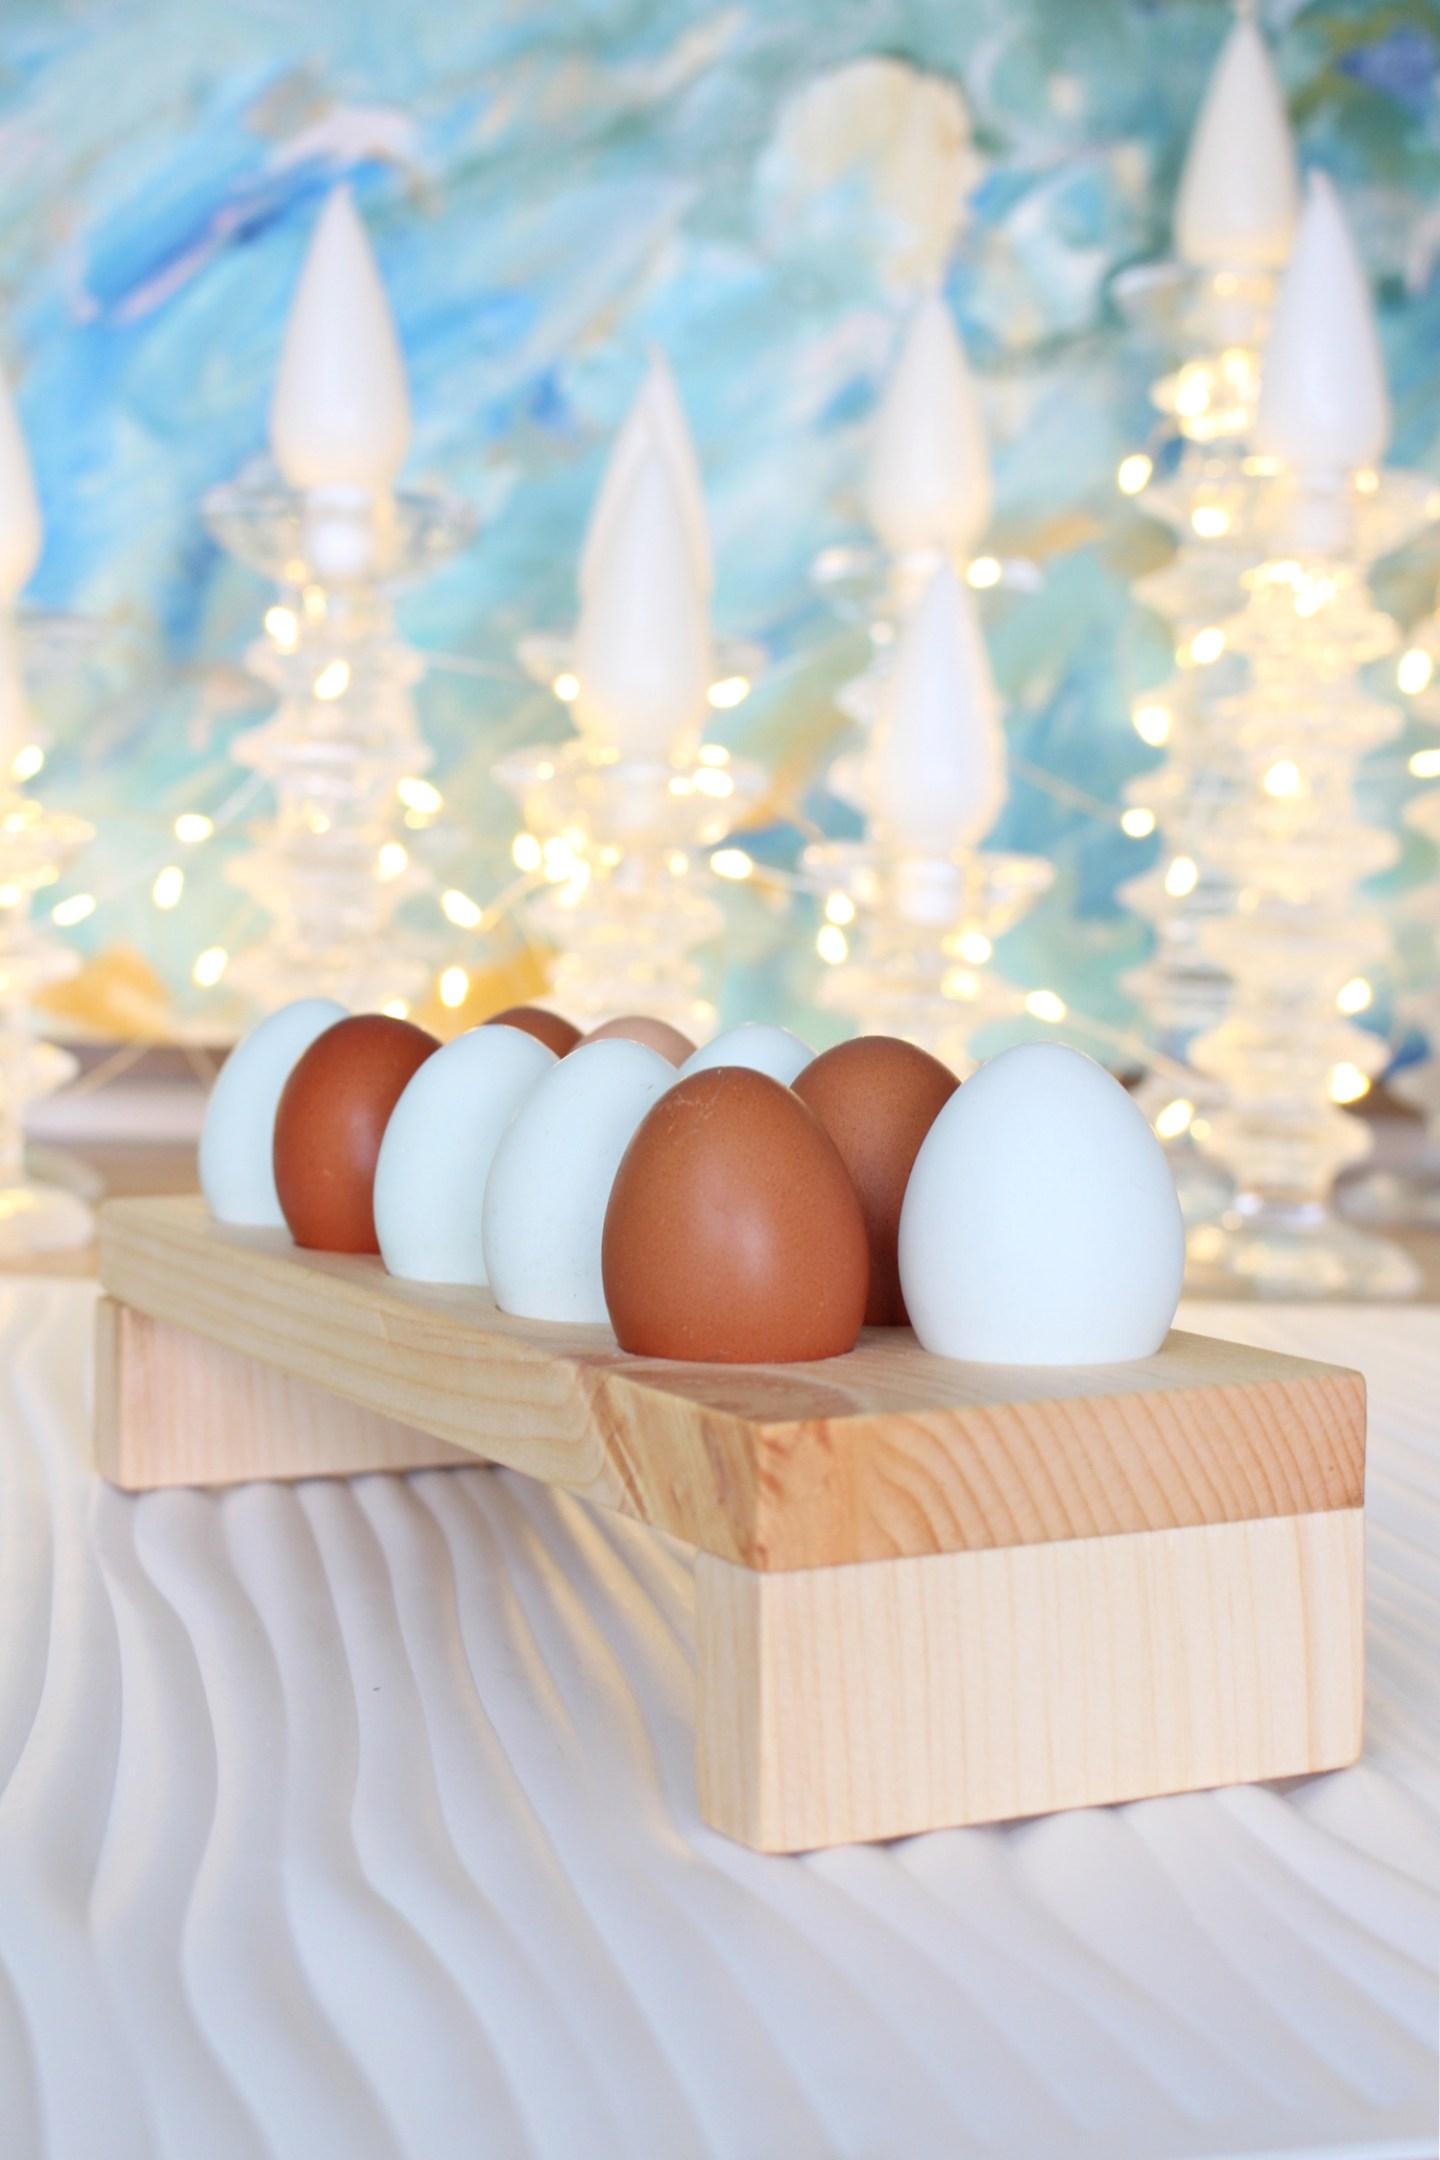 DIY wooden egg holder